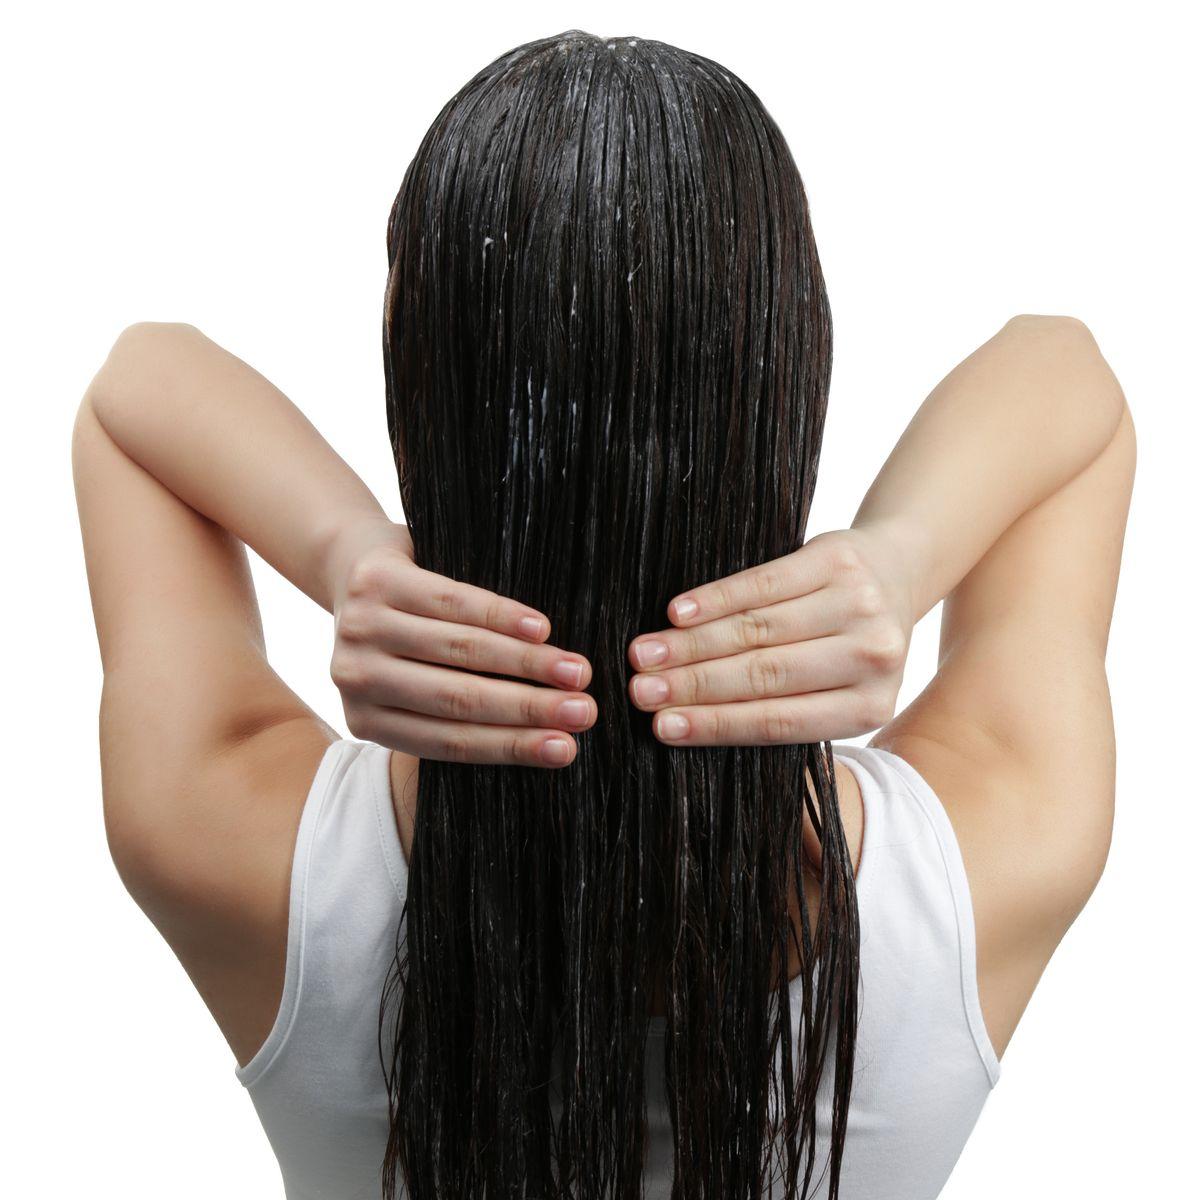 Minyak urang aring dapat langsung dioleskan ke kulit kepala